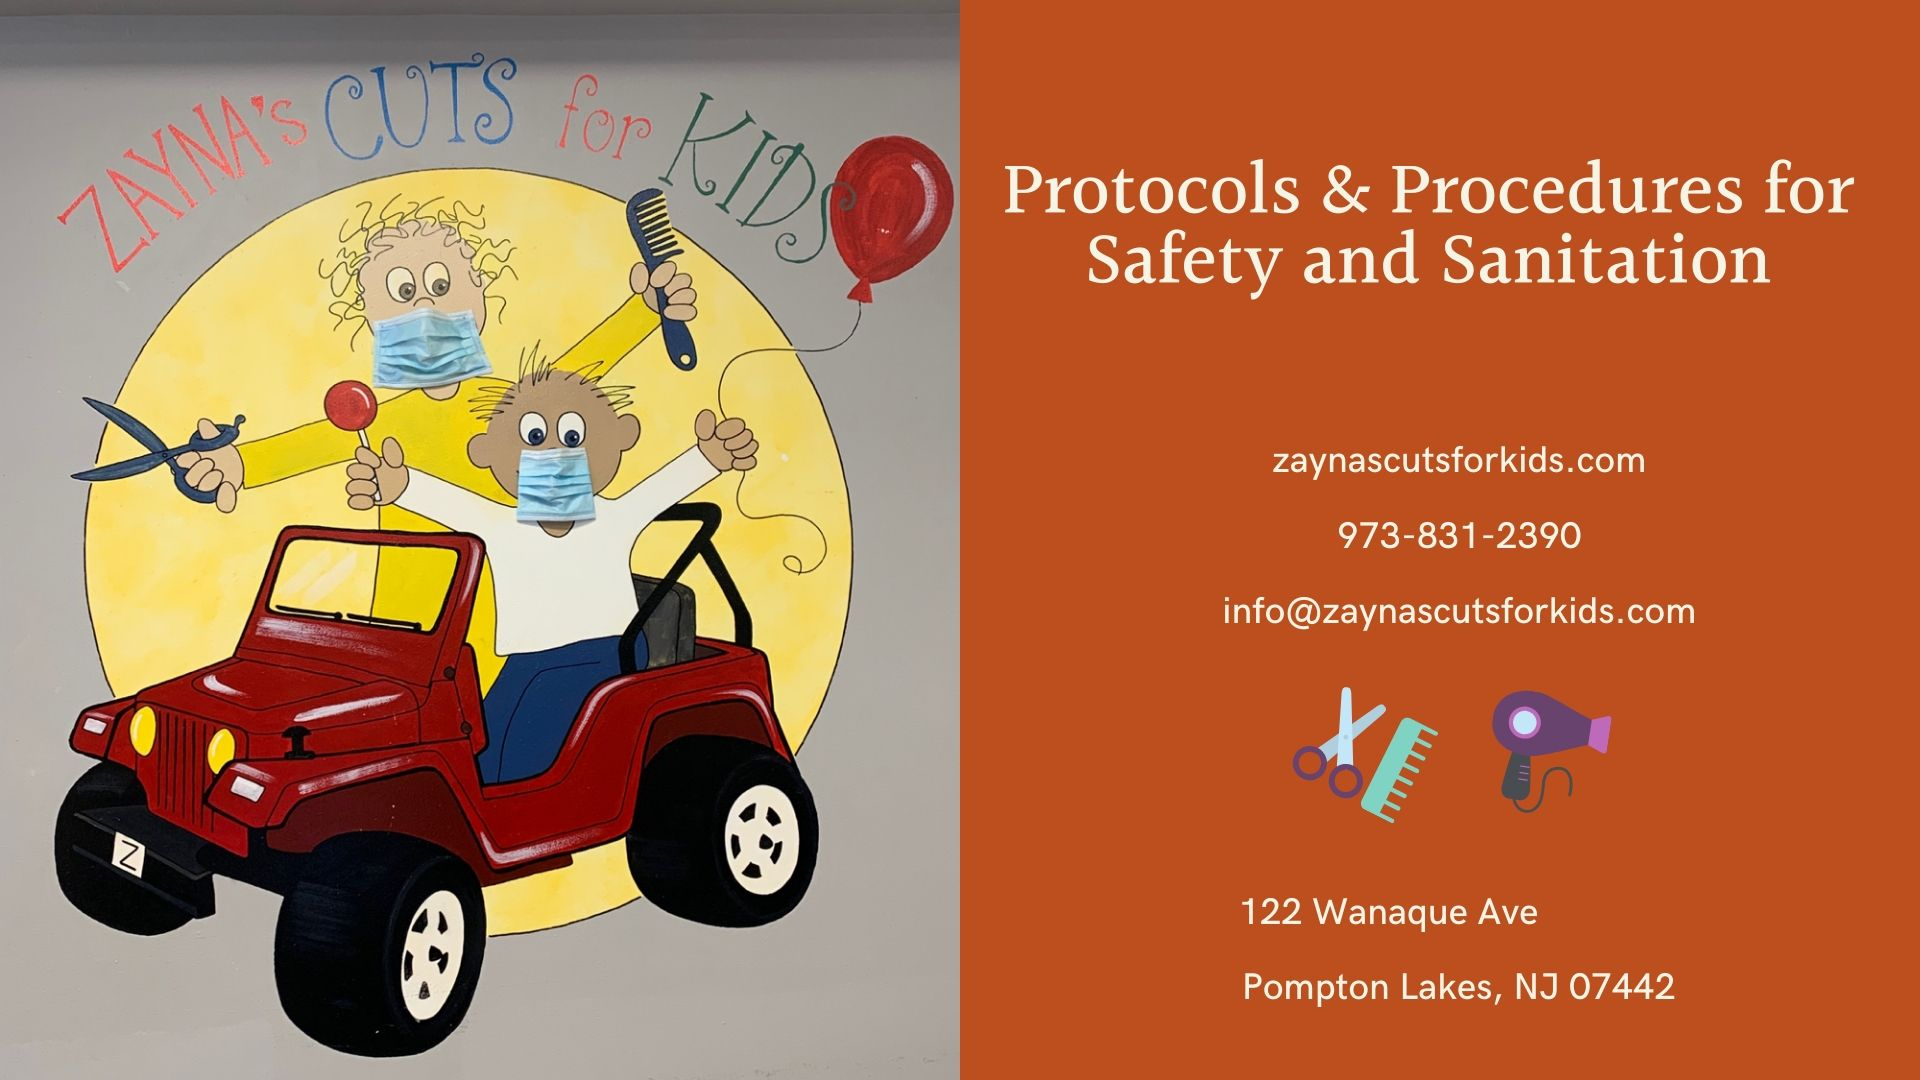 Protocols and Procedures